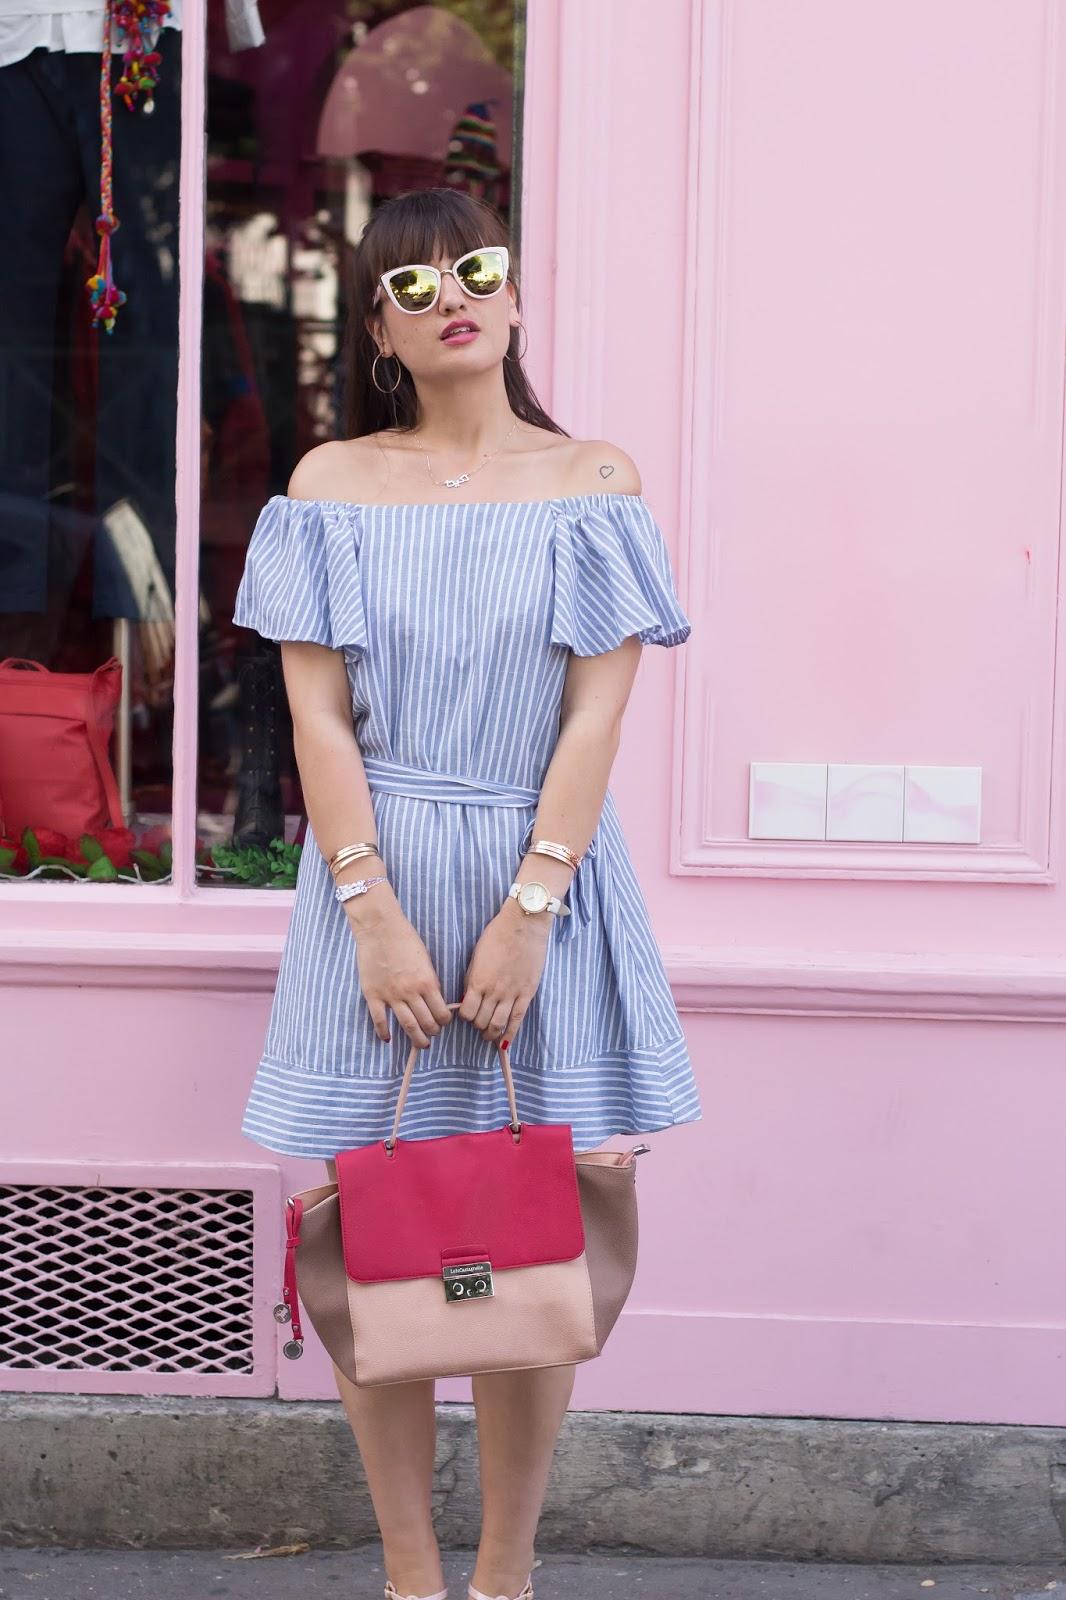 meetmeinparee, summer style, cute look, nikita wong, paris, parisian blogger, parisian style, fashion photography